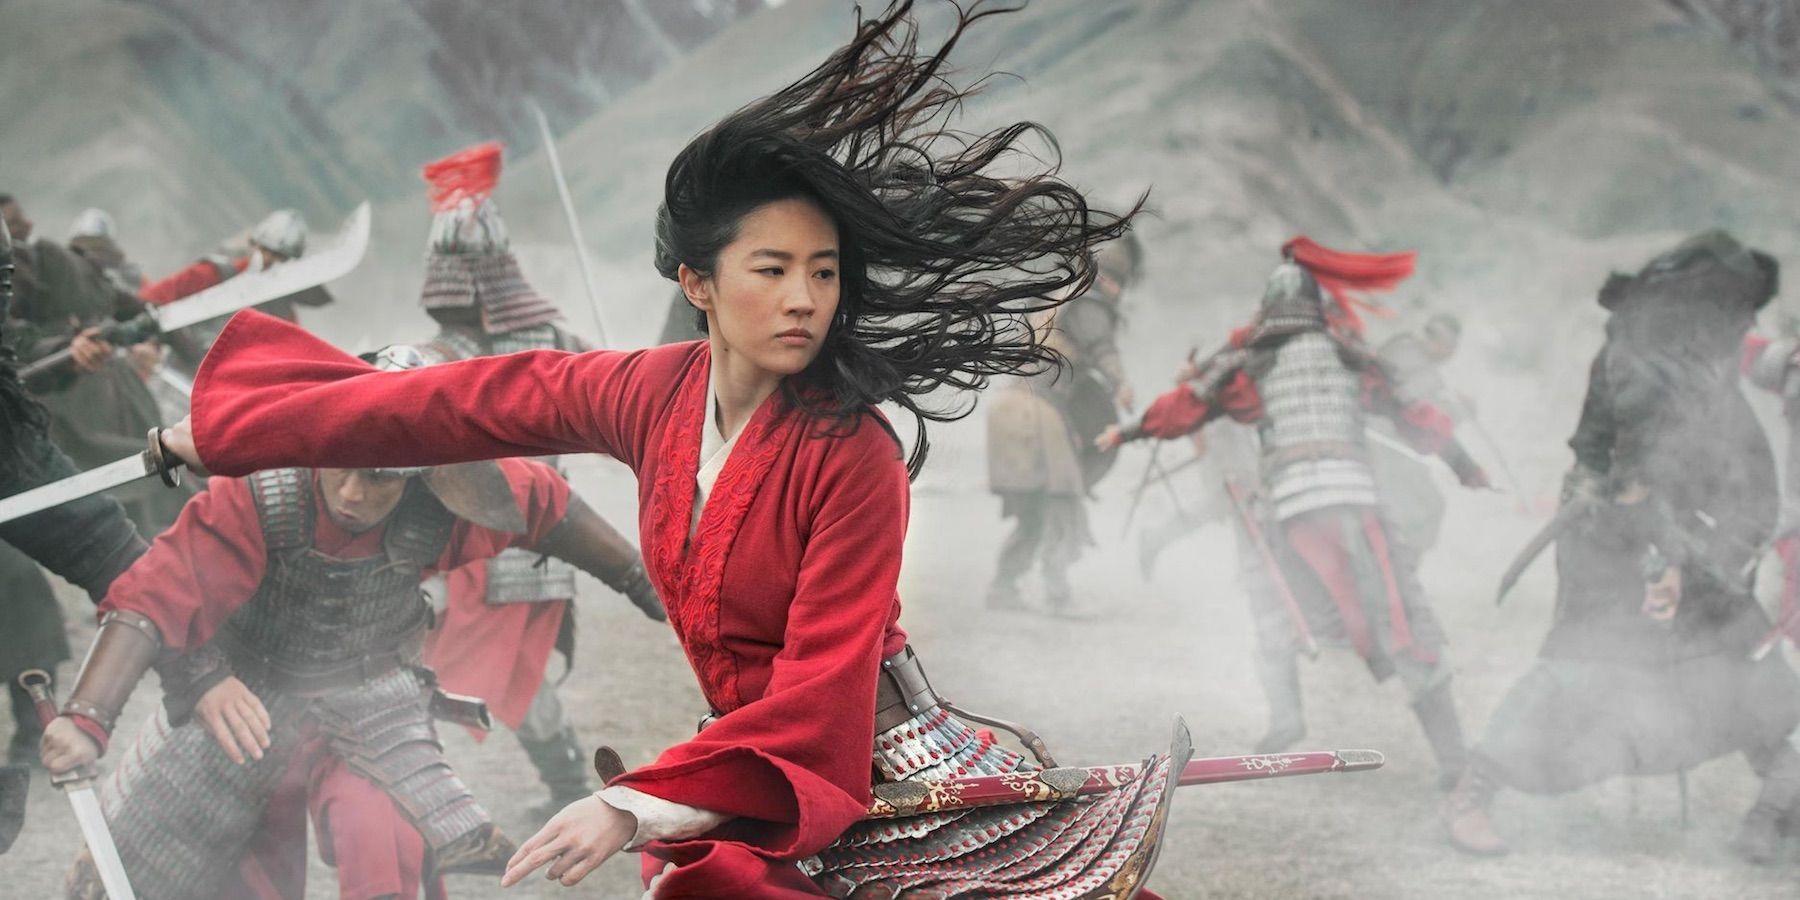 #BoycottMulan and the Great Hollywood-China Hypocrisy